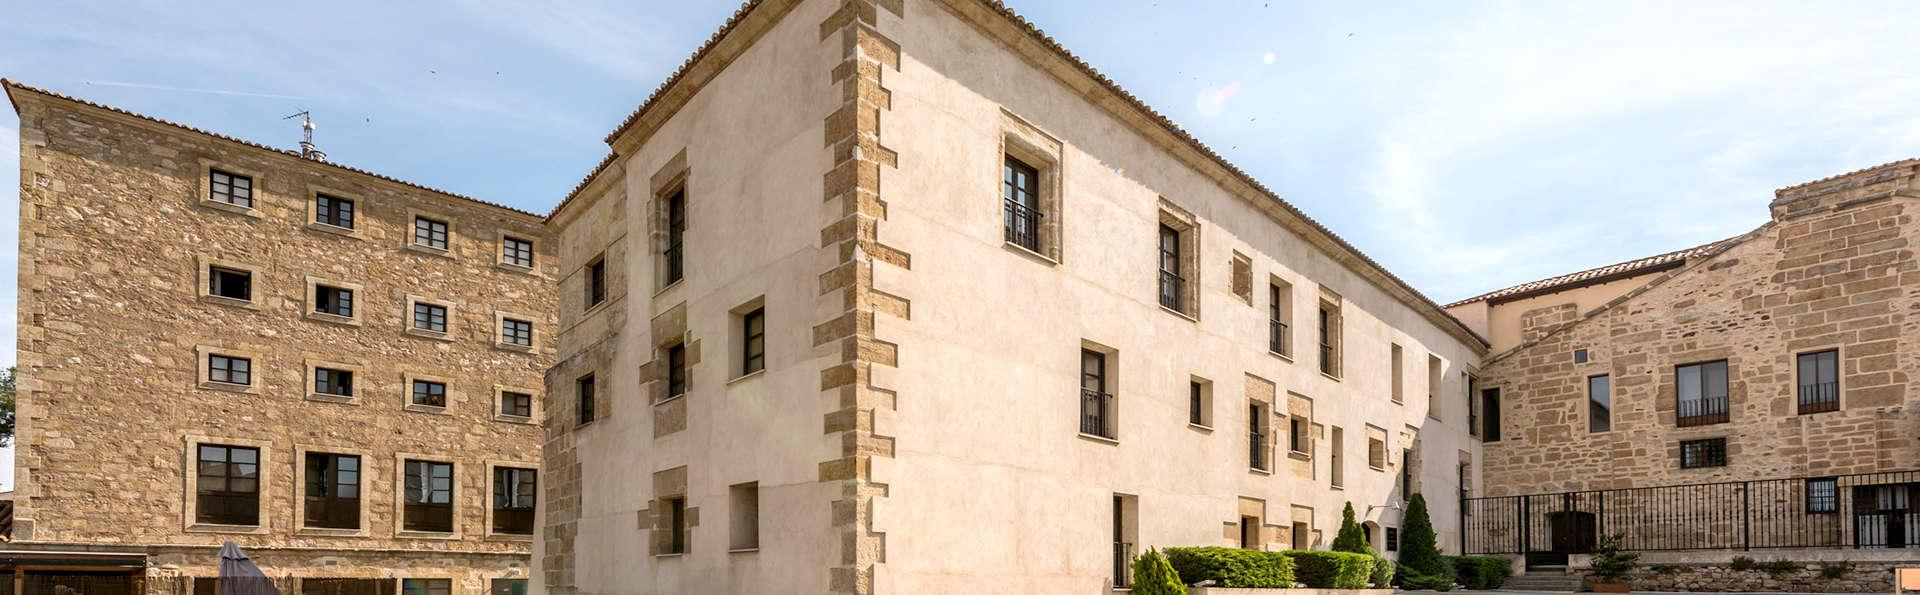 Hospes Palacio de San Esteban - EDIT_NEW_FRONT4.jpg